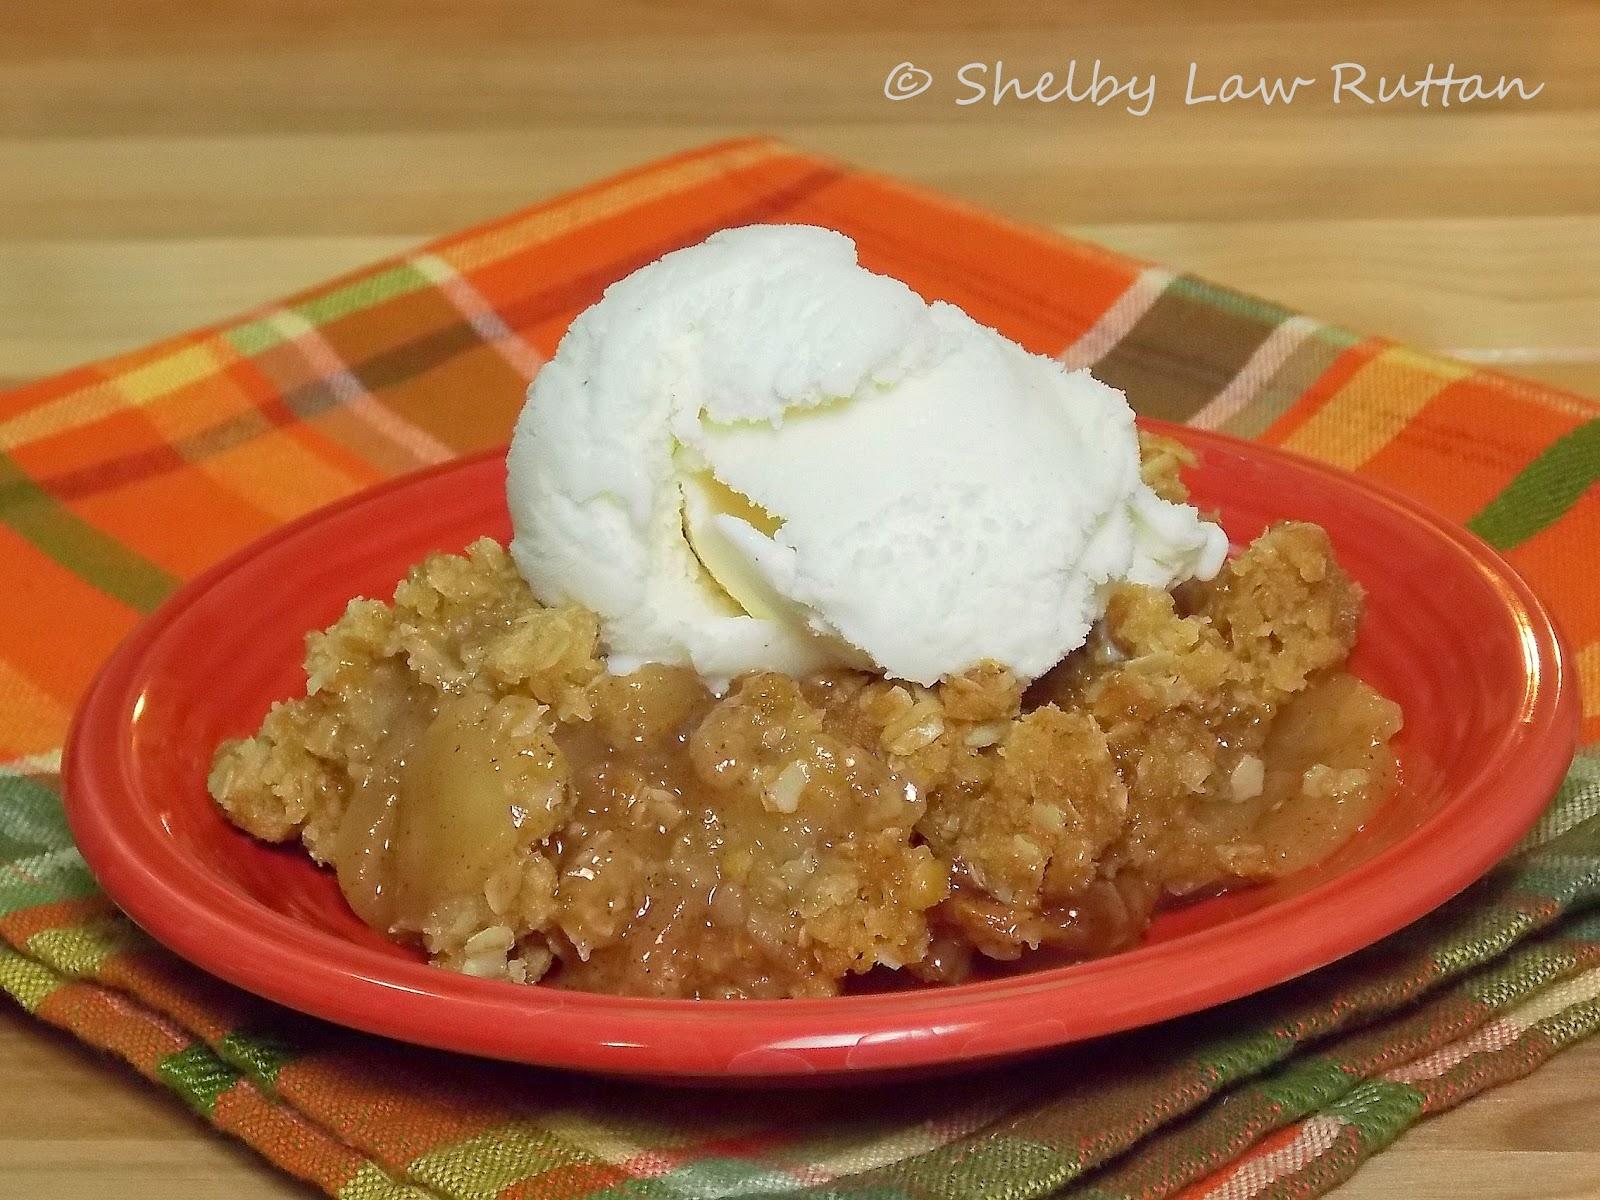 The Best Apple Crisp I ever made - Grumpy's Honey Bunch